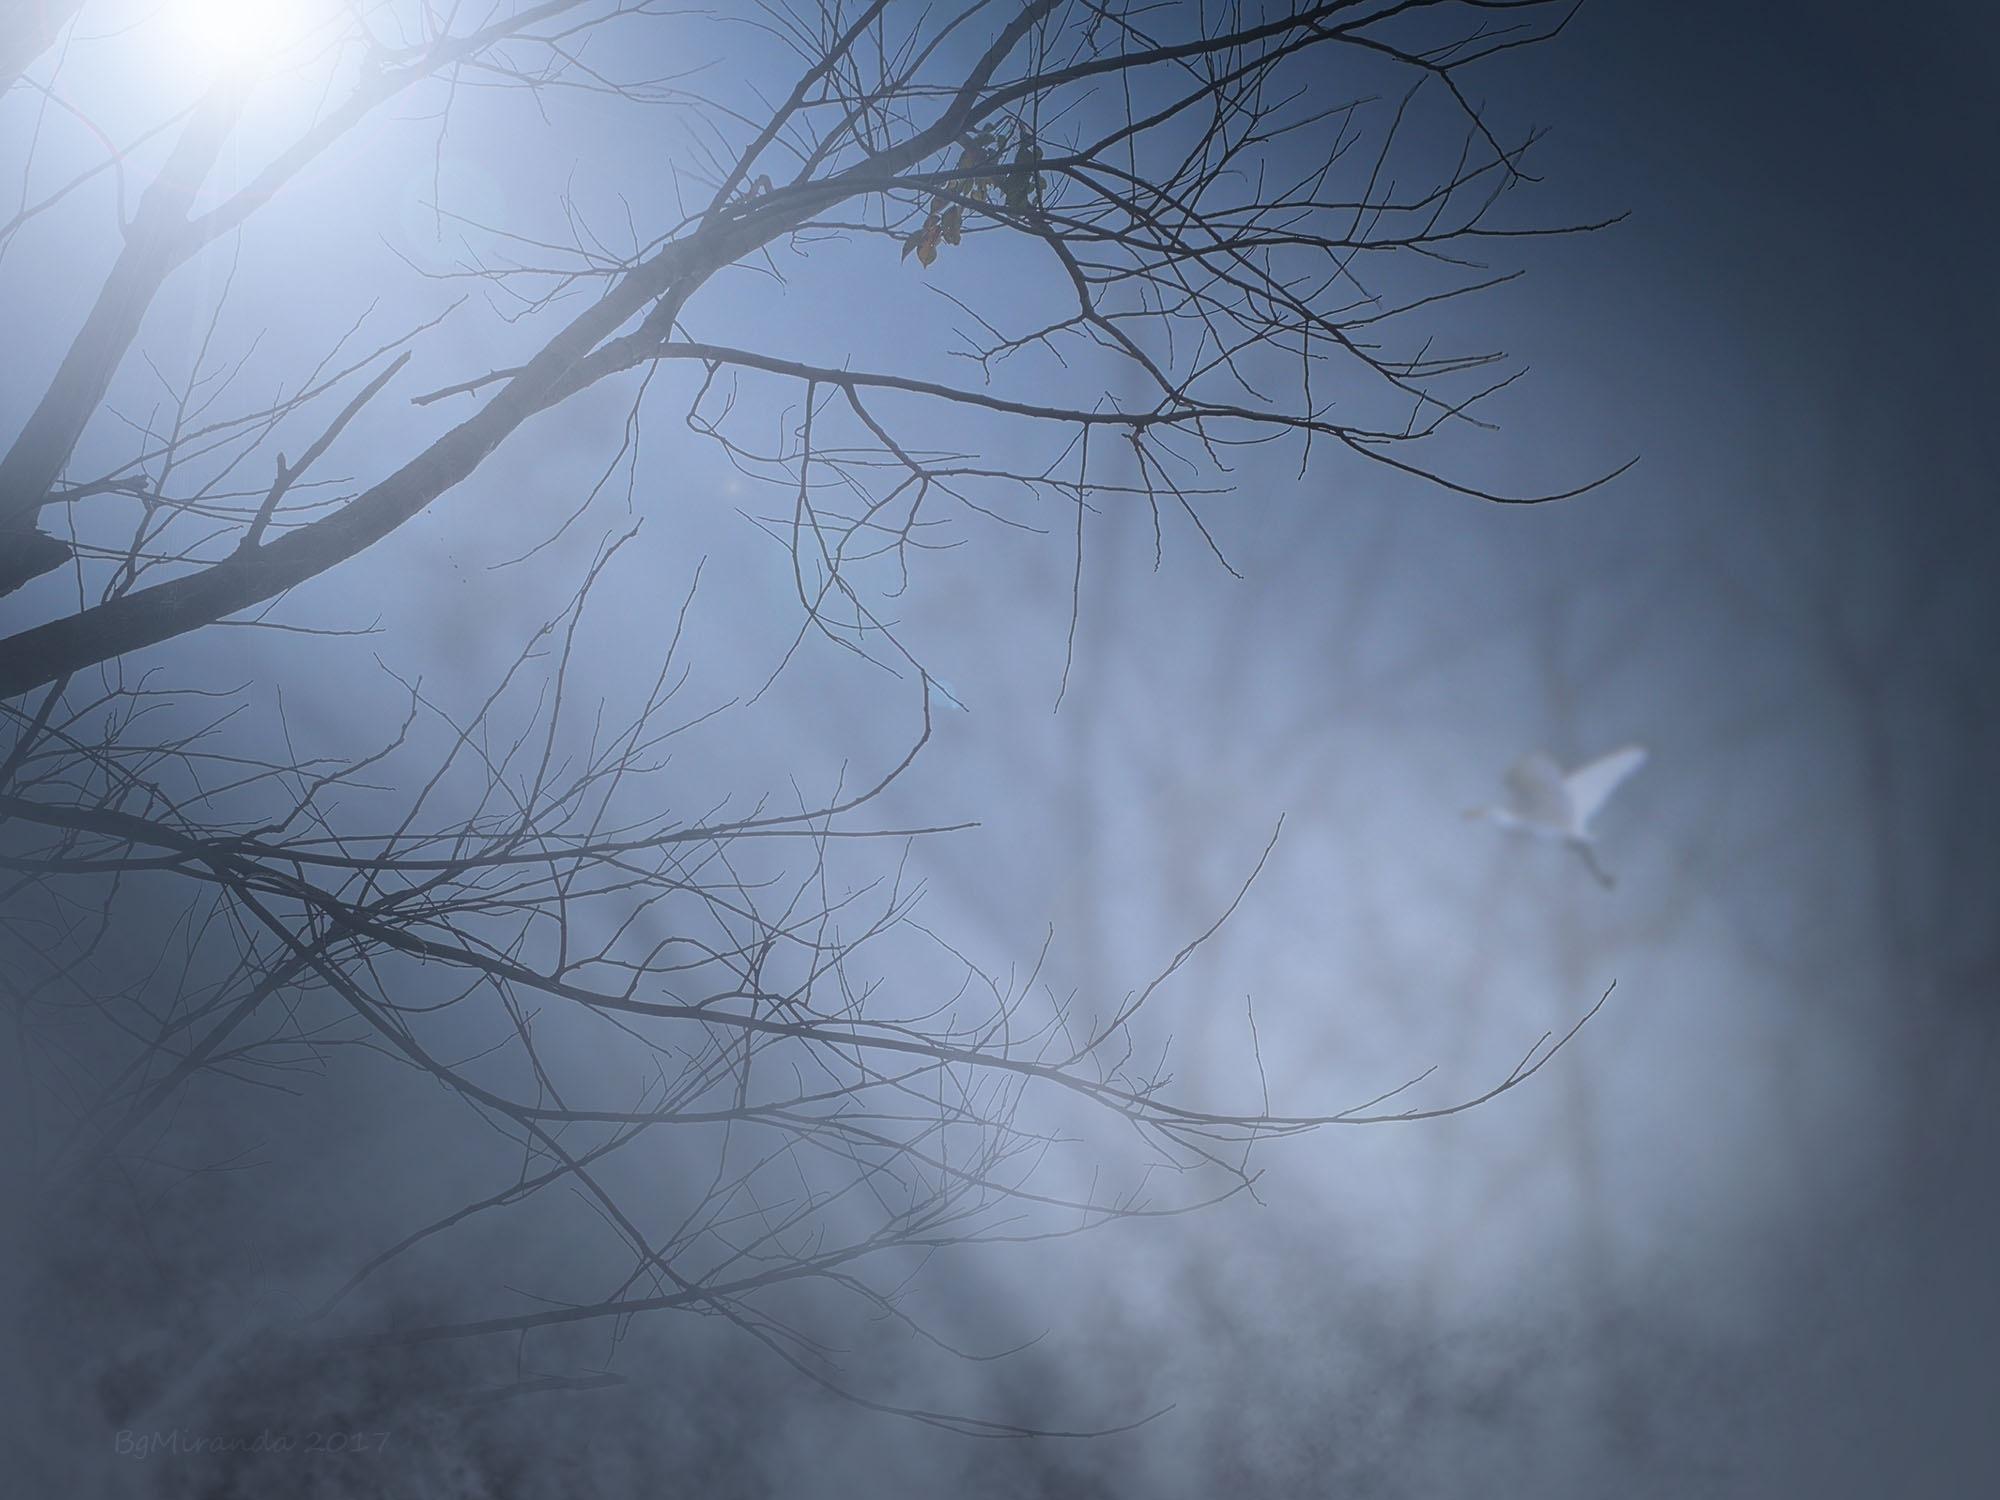 Looking for Nest by Bernard Miranda